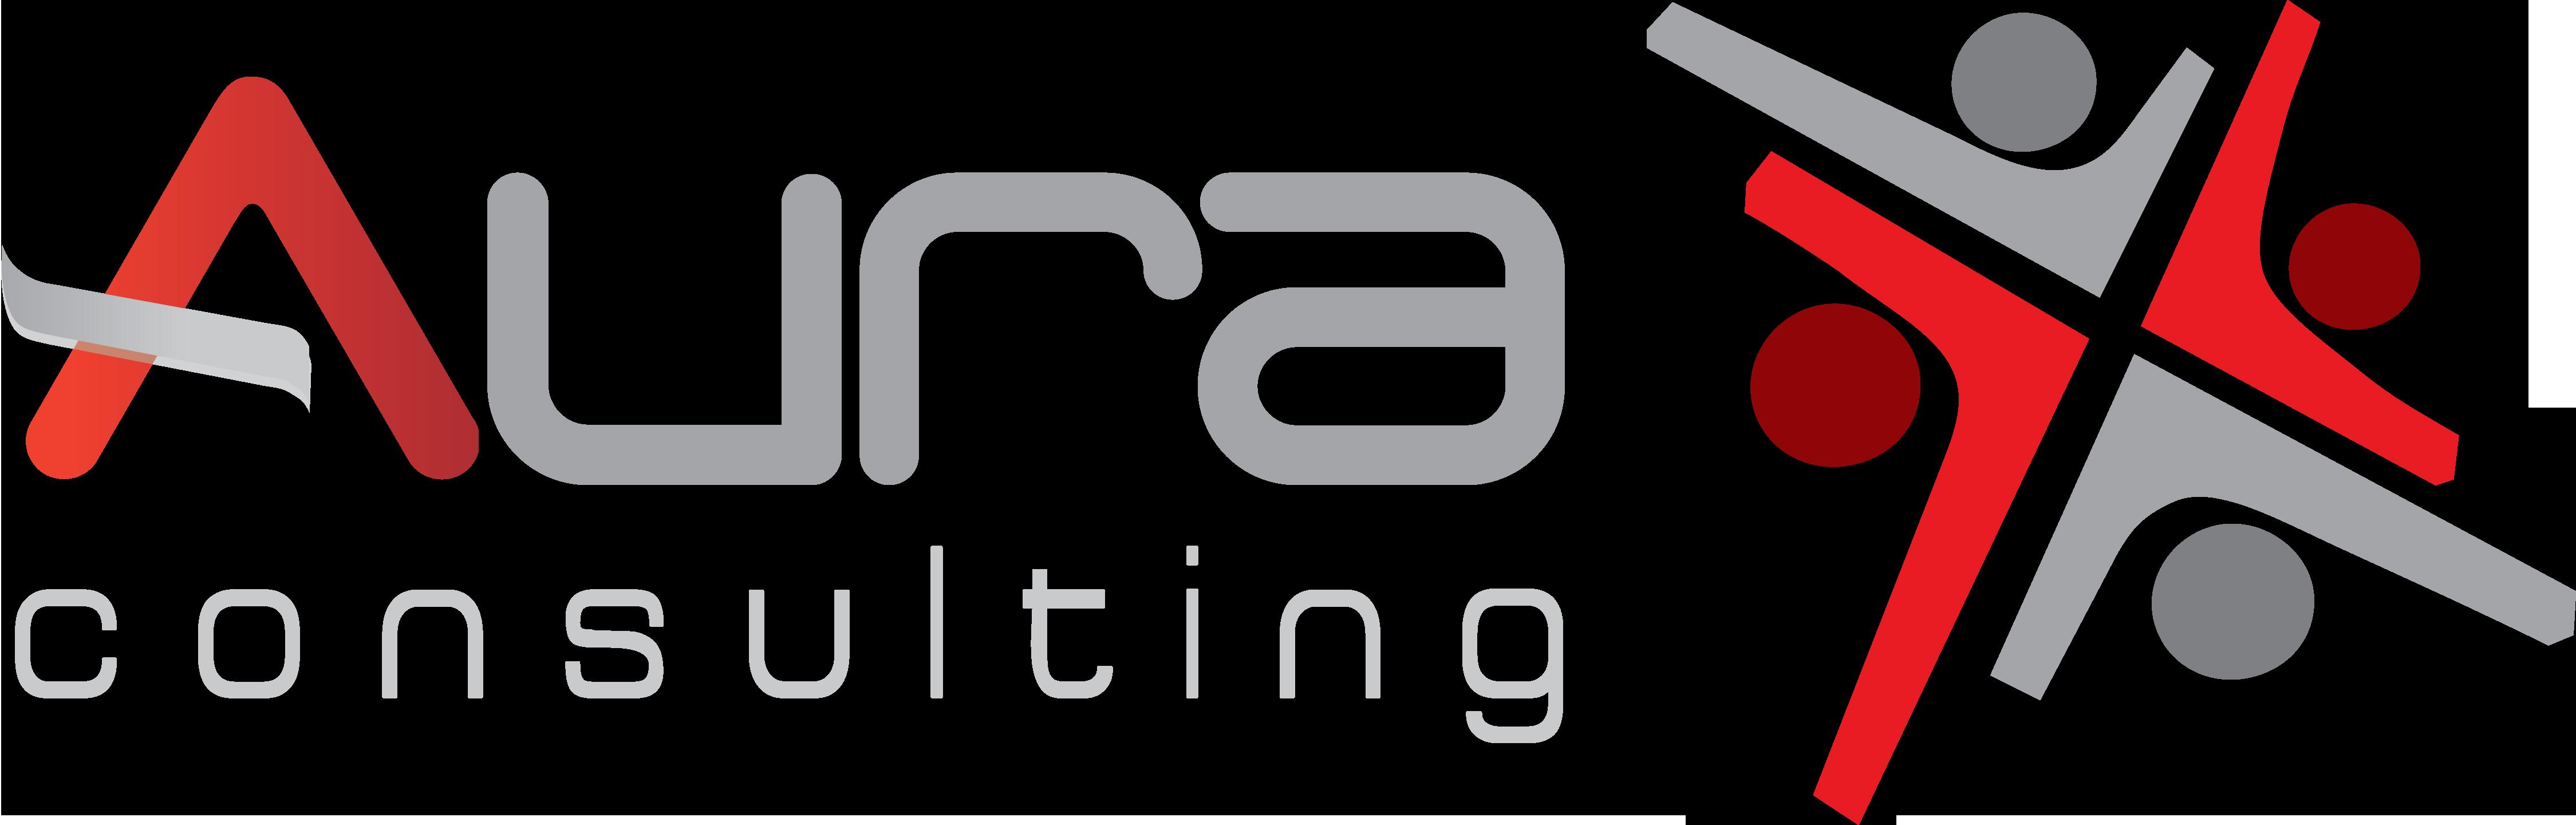 Aura Consulting - Digital Agency